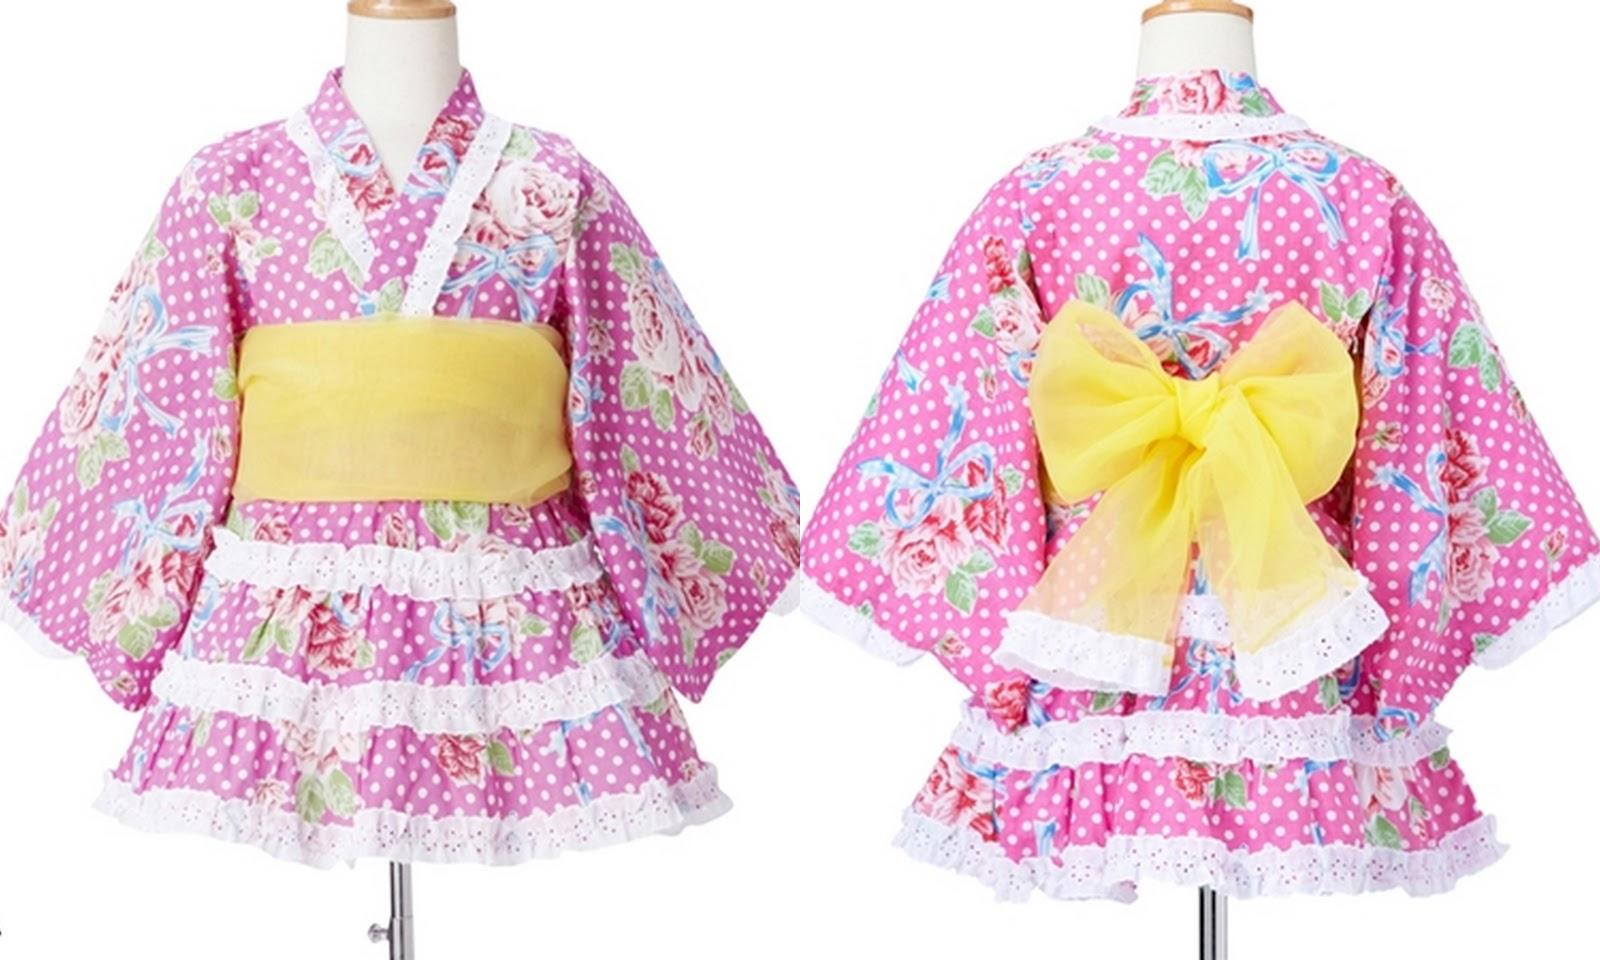 Daidai & Pipi 的快樂魔法: [網購] 日本直送日系衣服大減價啊! @ nissen